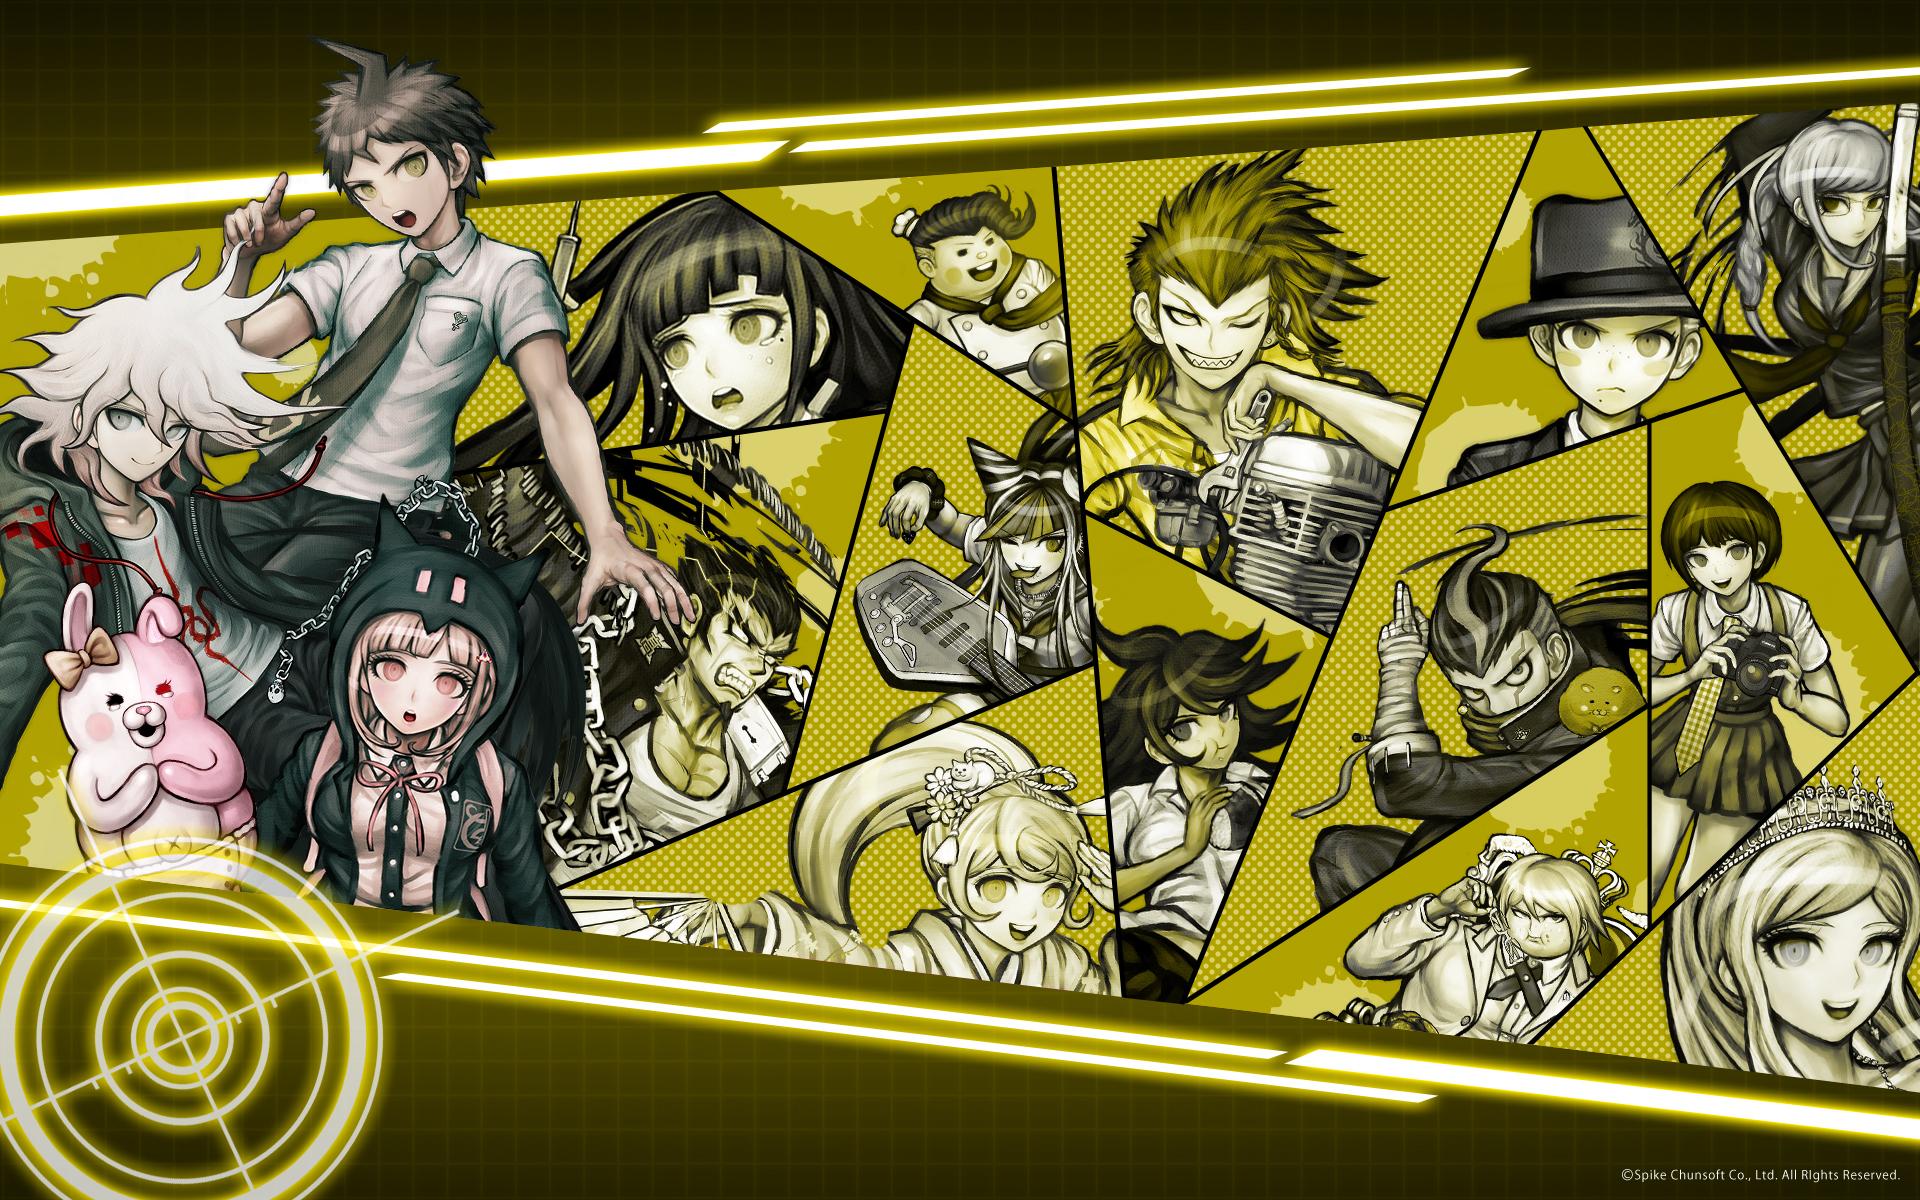 Backgrounds Danganronpa Download Danganronpa Anime Music Danganronpa V3